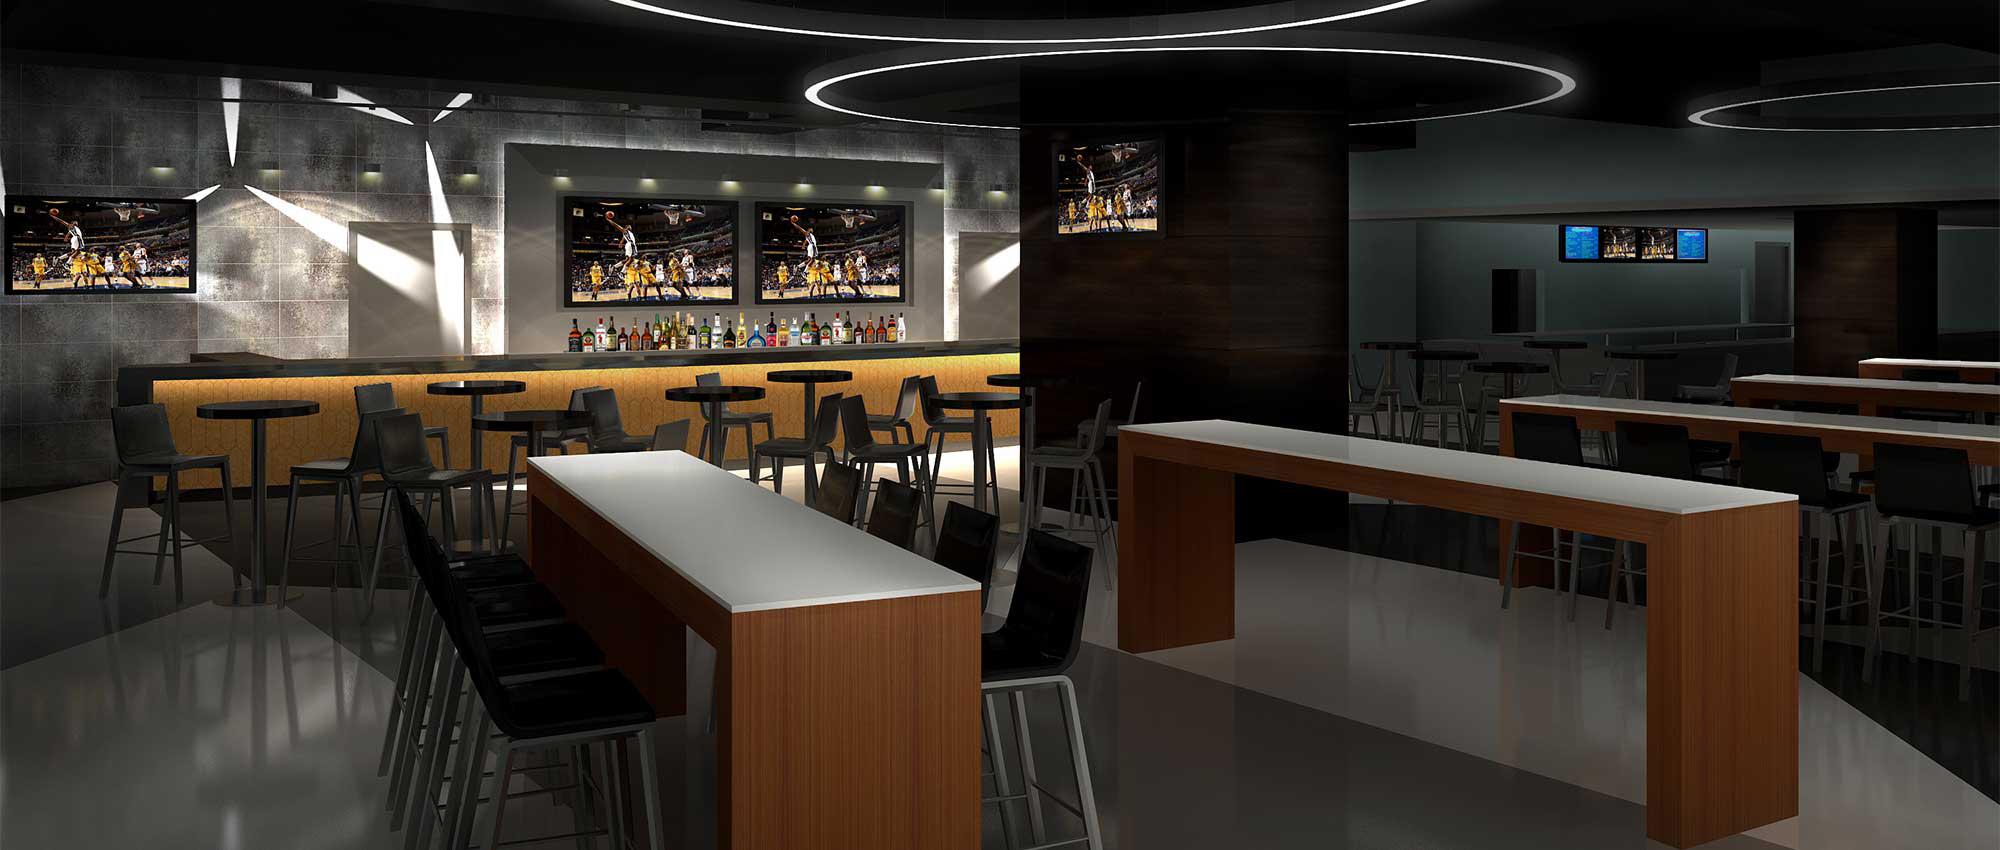 Bexar oks 101 5 million in at t center upgrades san for Dining near at t center san antonio